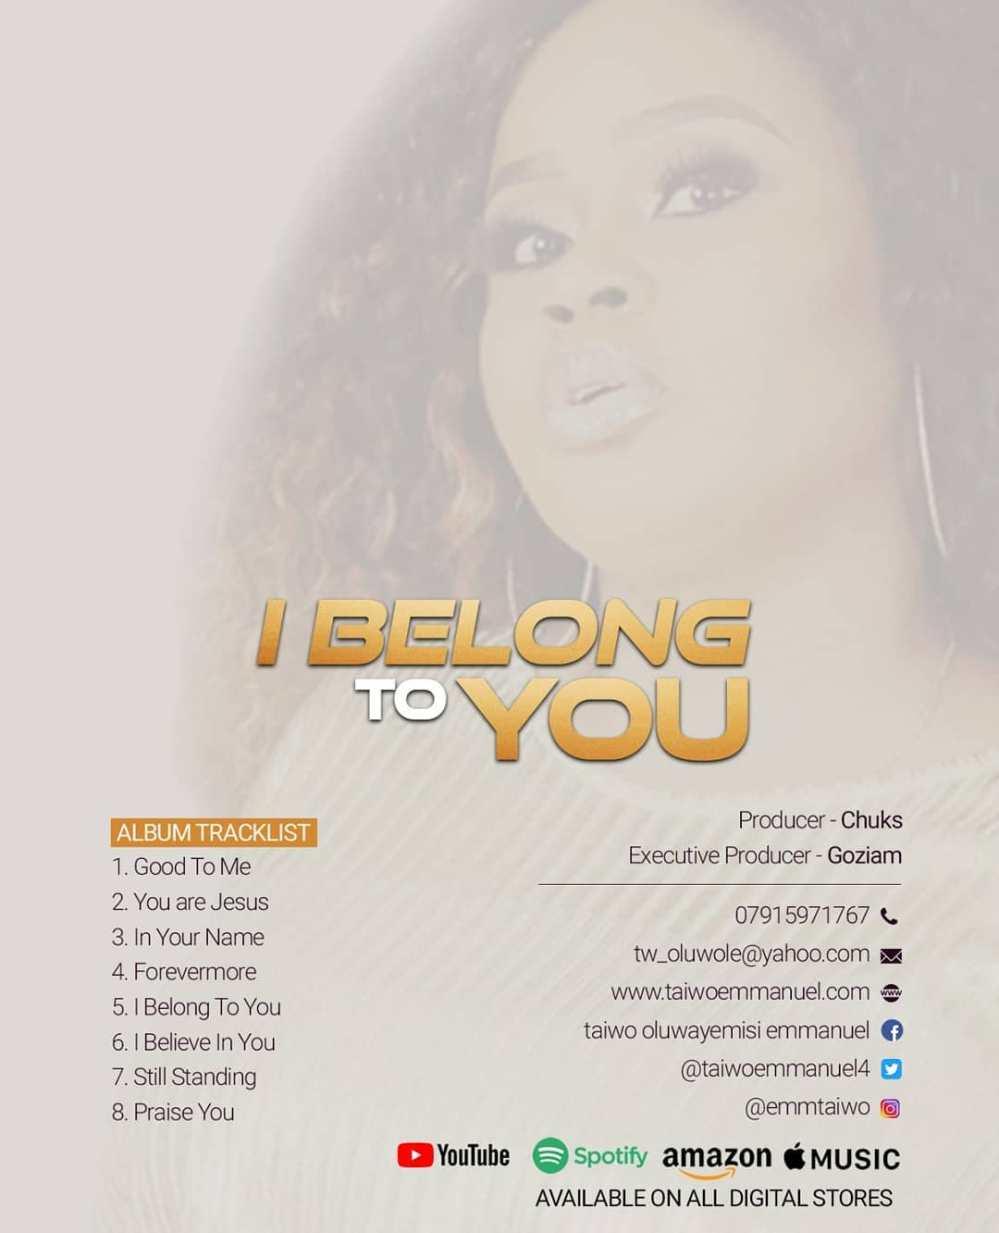 I Belong To You tracklist